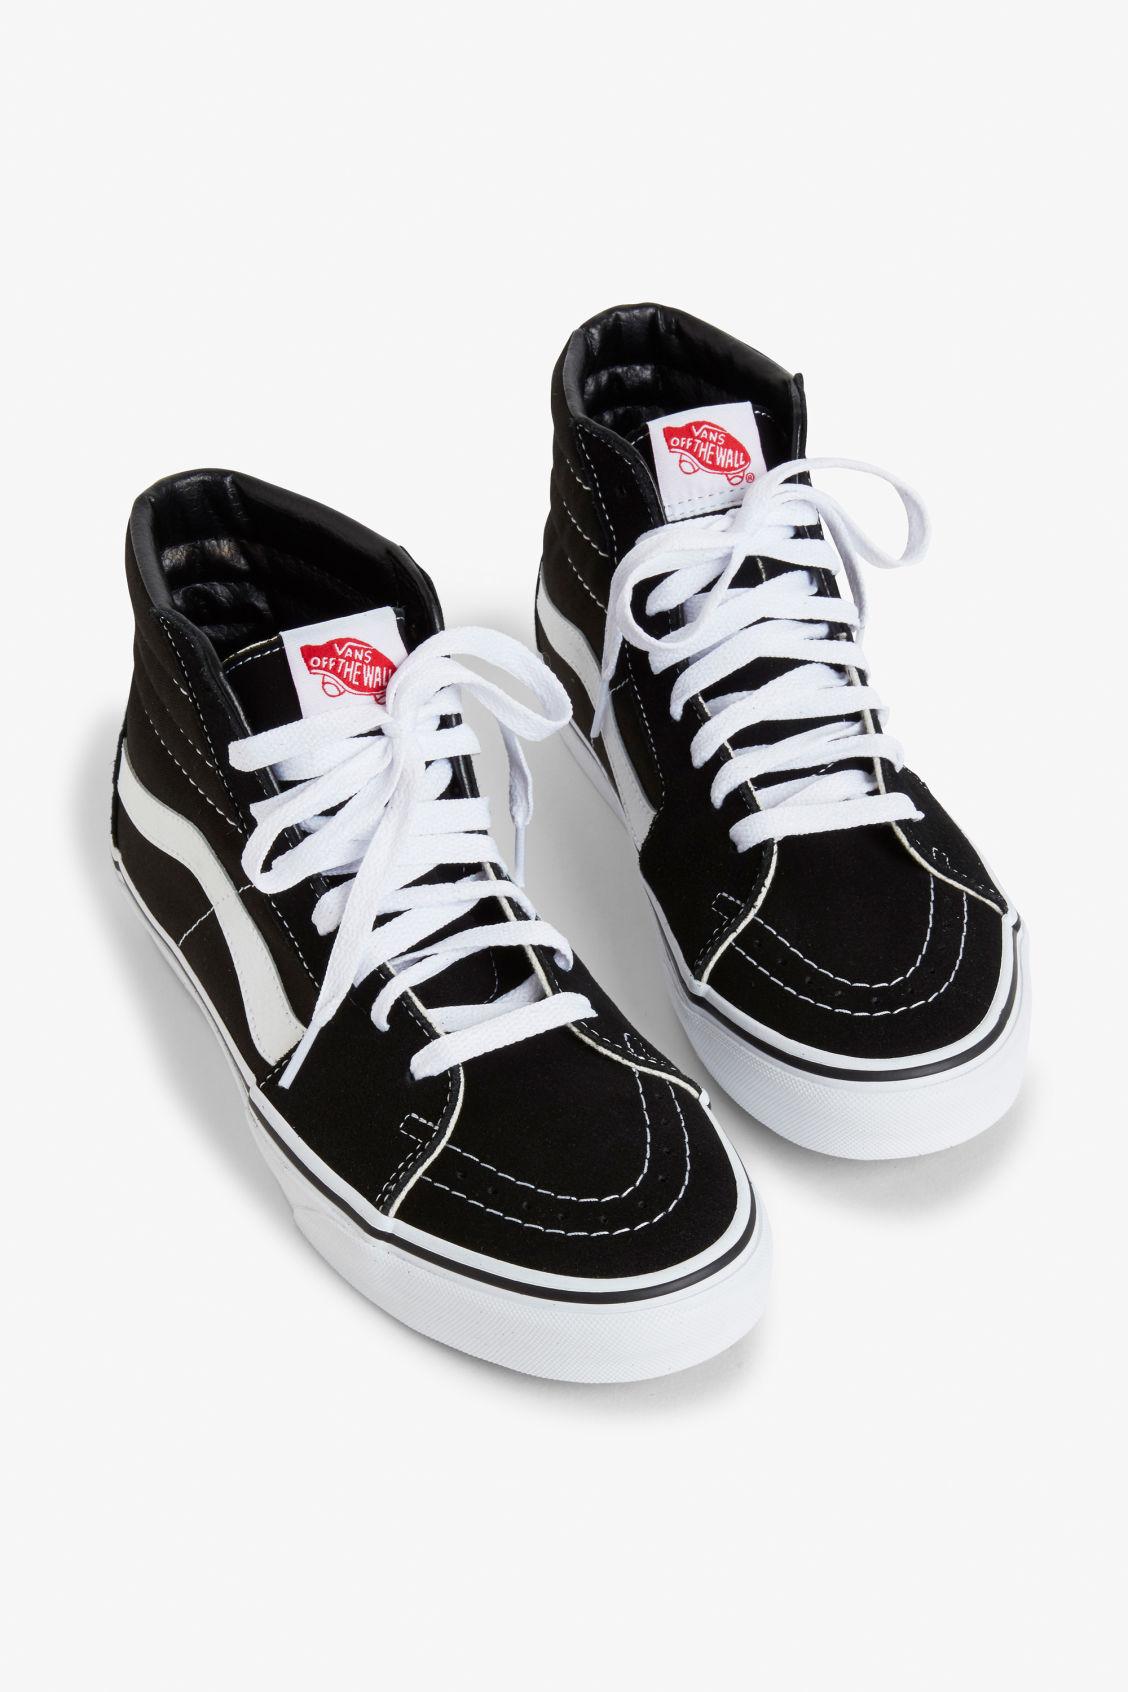 a18526b784 Vans old skool platforms - Black magic - Shoes - Monki